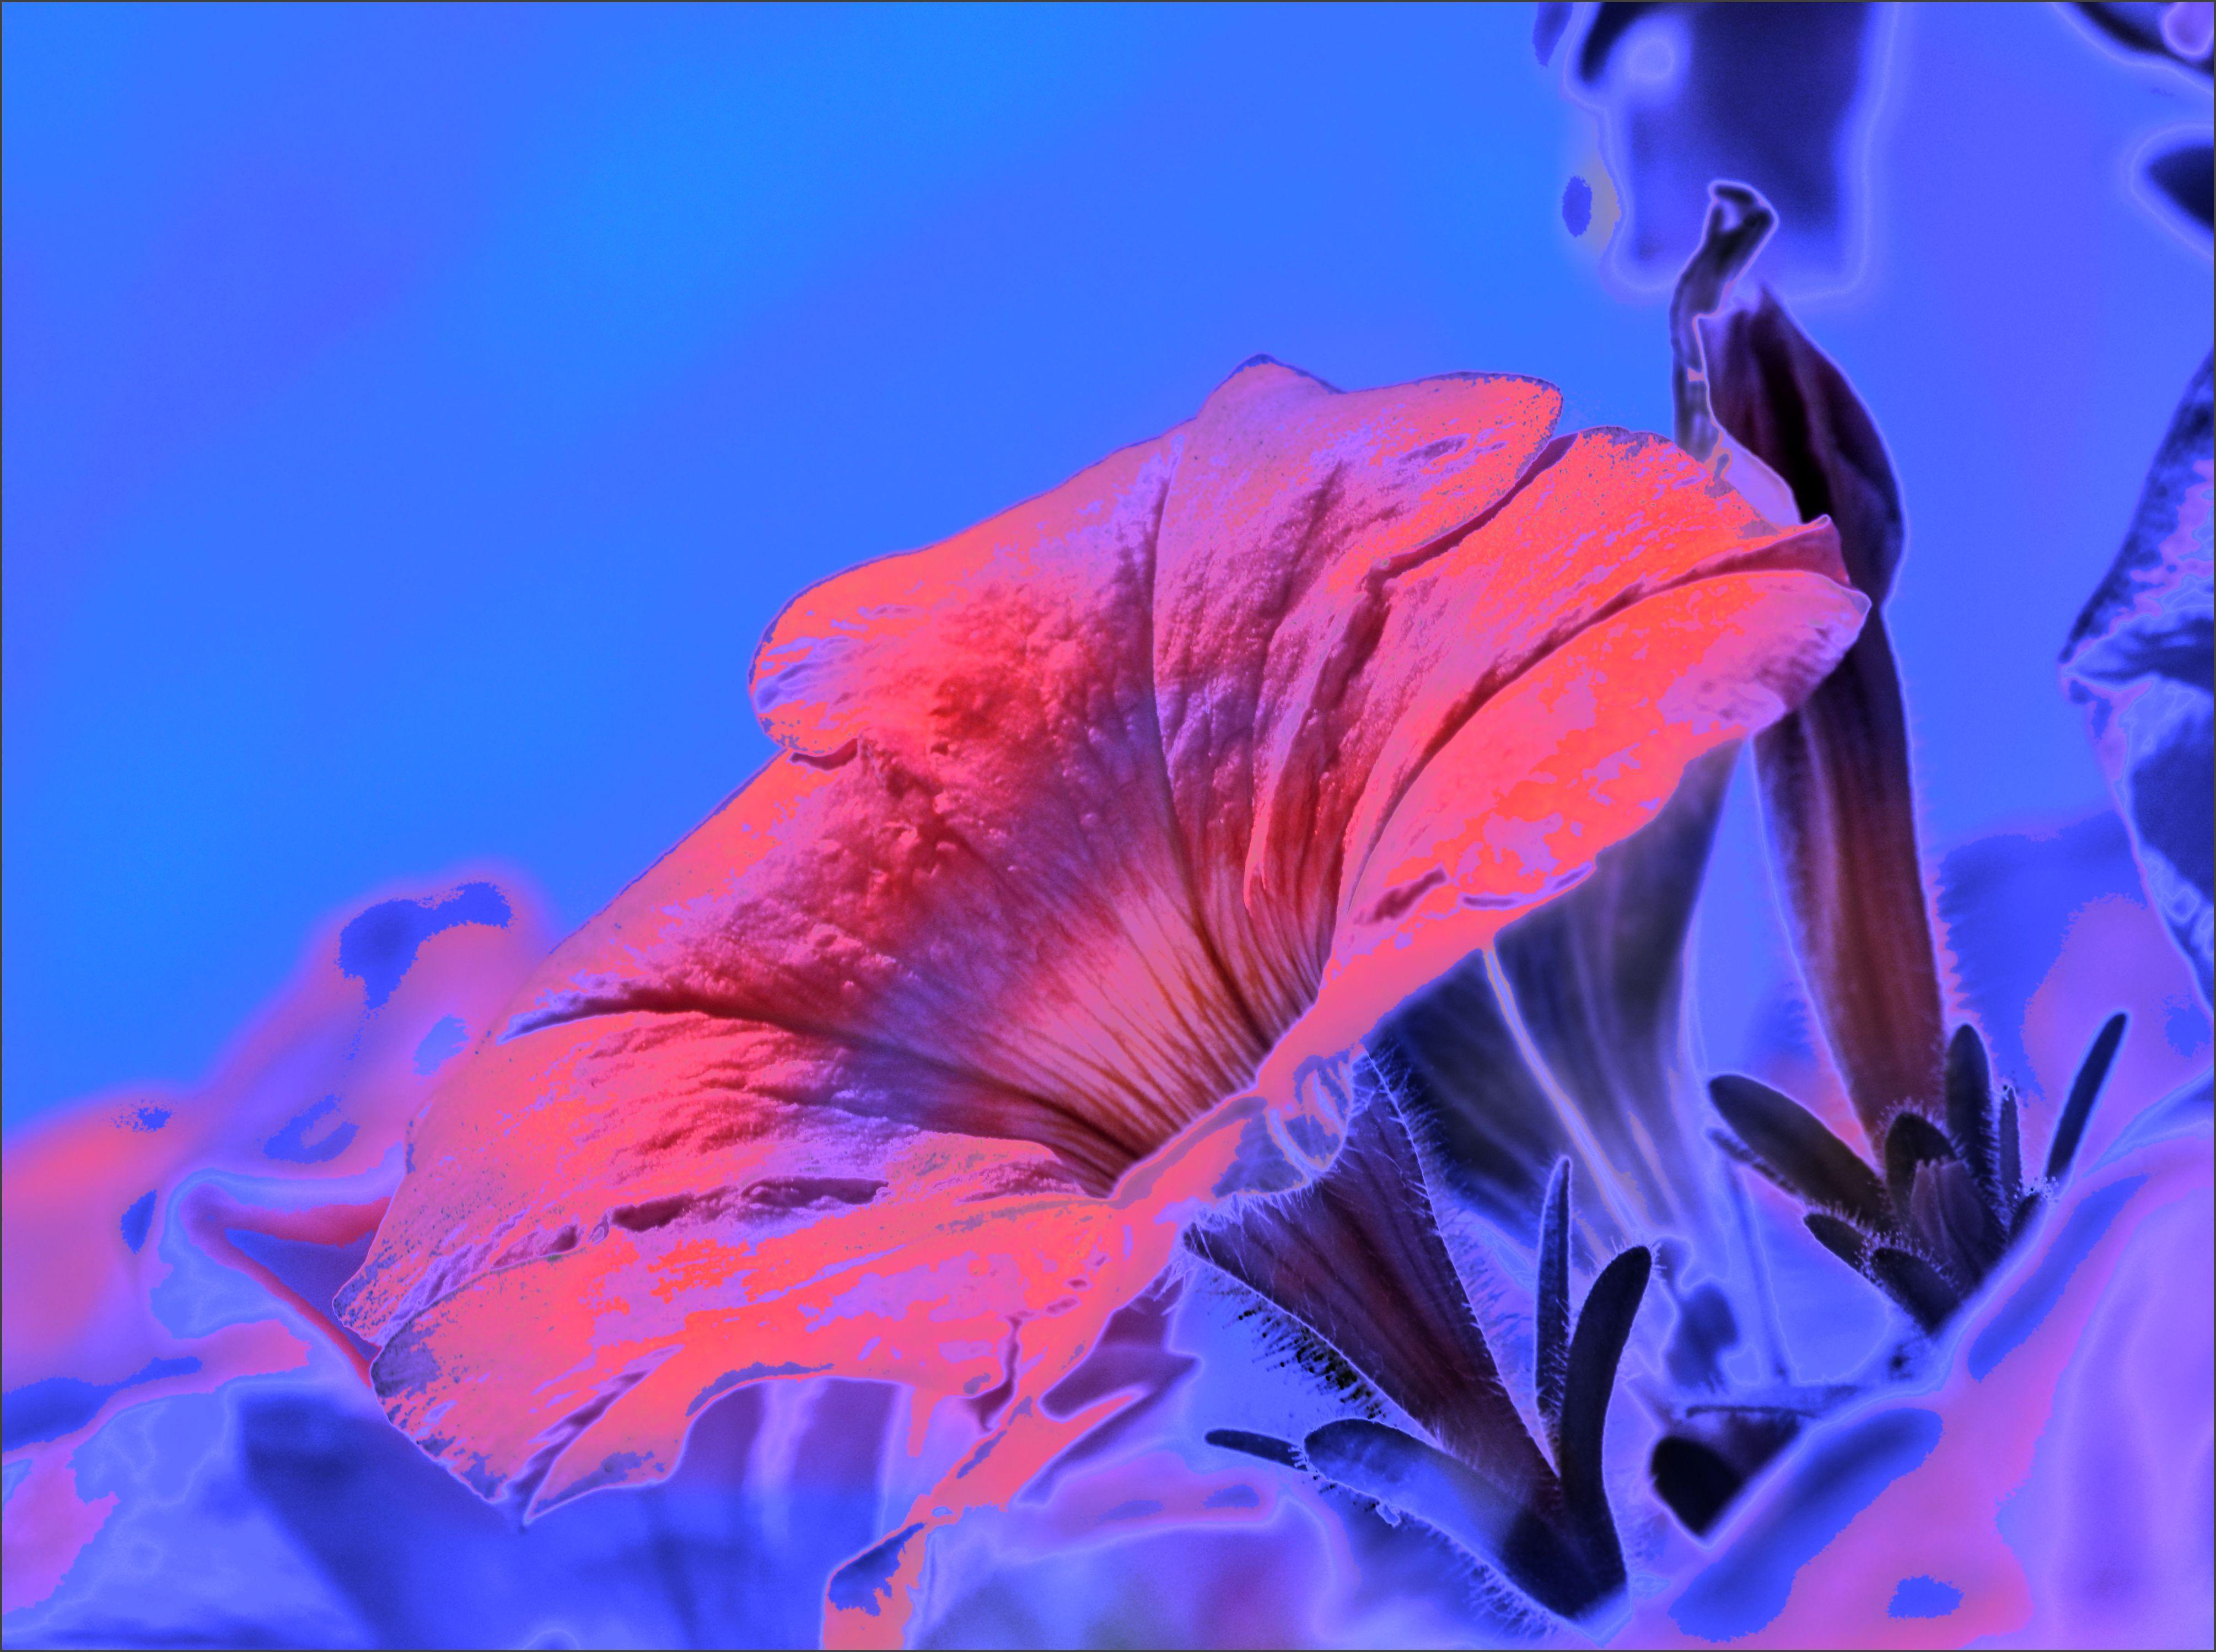 Paling Keren 10+ Wallpaper Warna Pink Tua - Richa Wallpaper